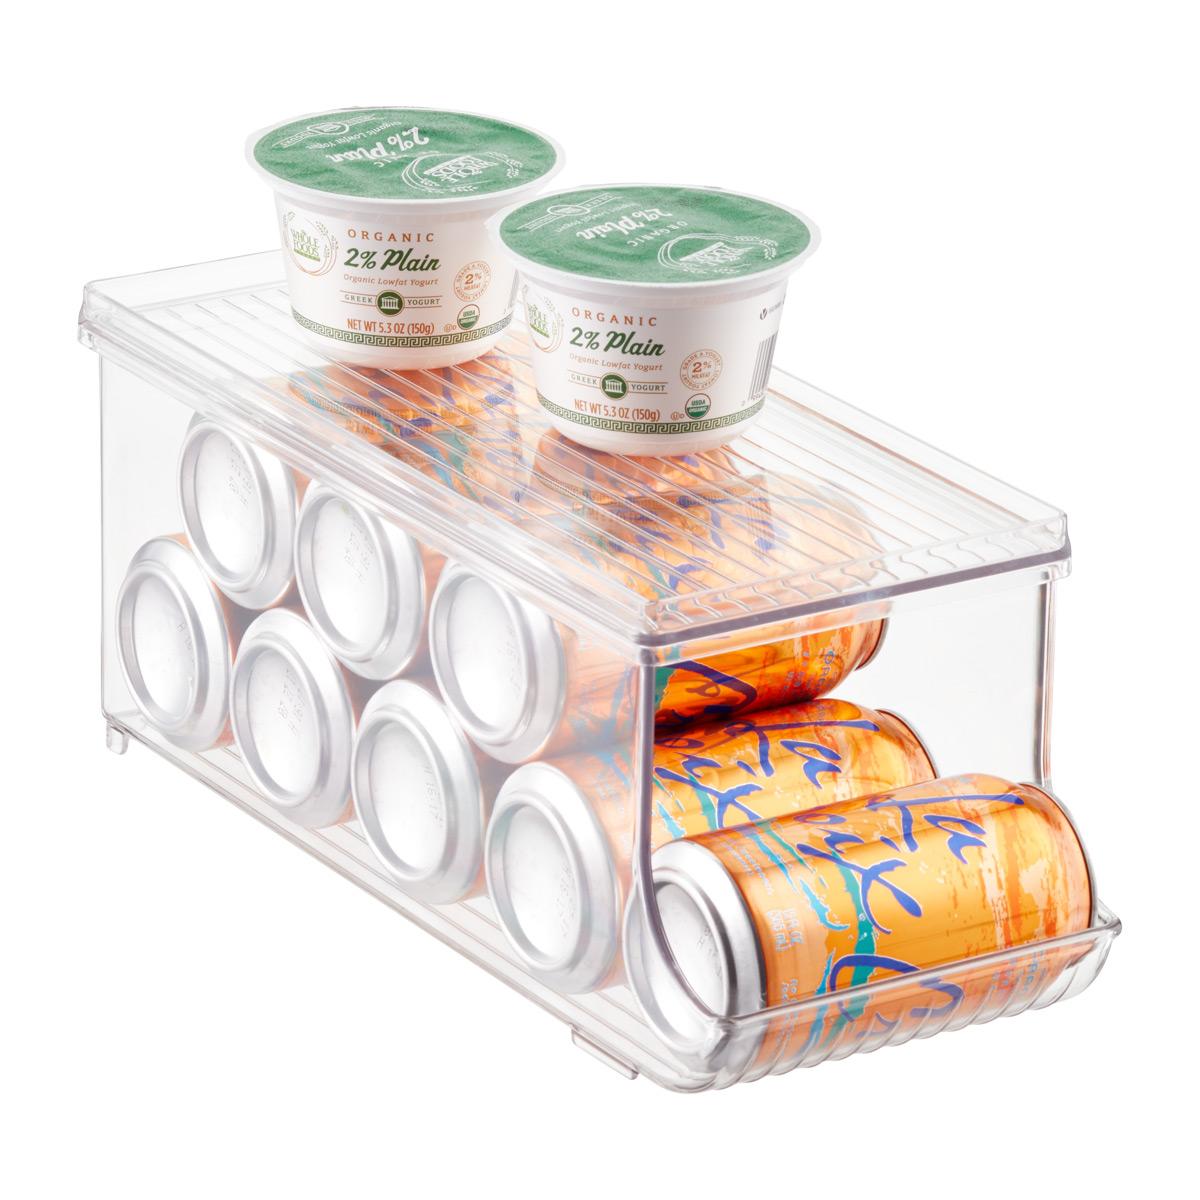 iDesign Linus Fridge Bins Soda Can Organizer with Shelf